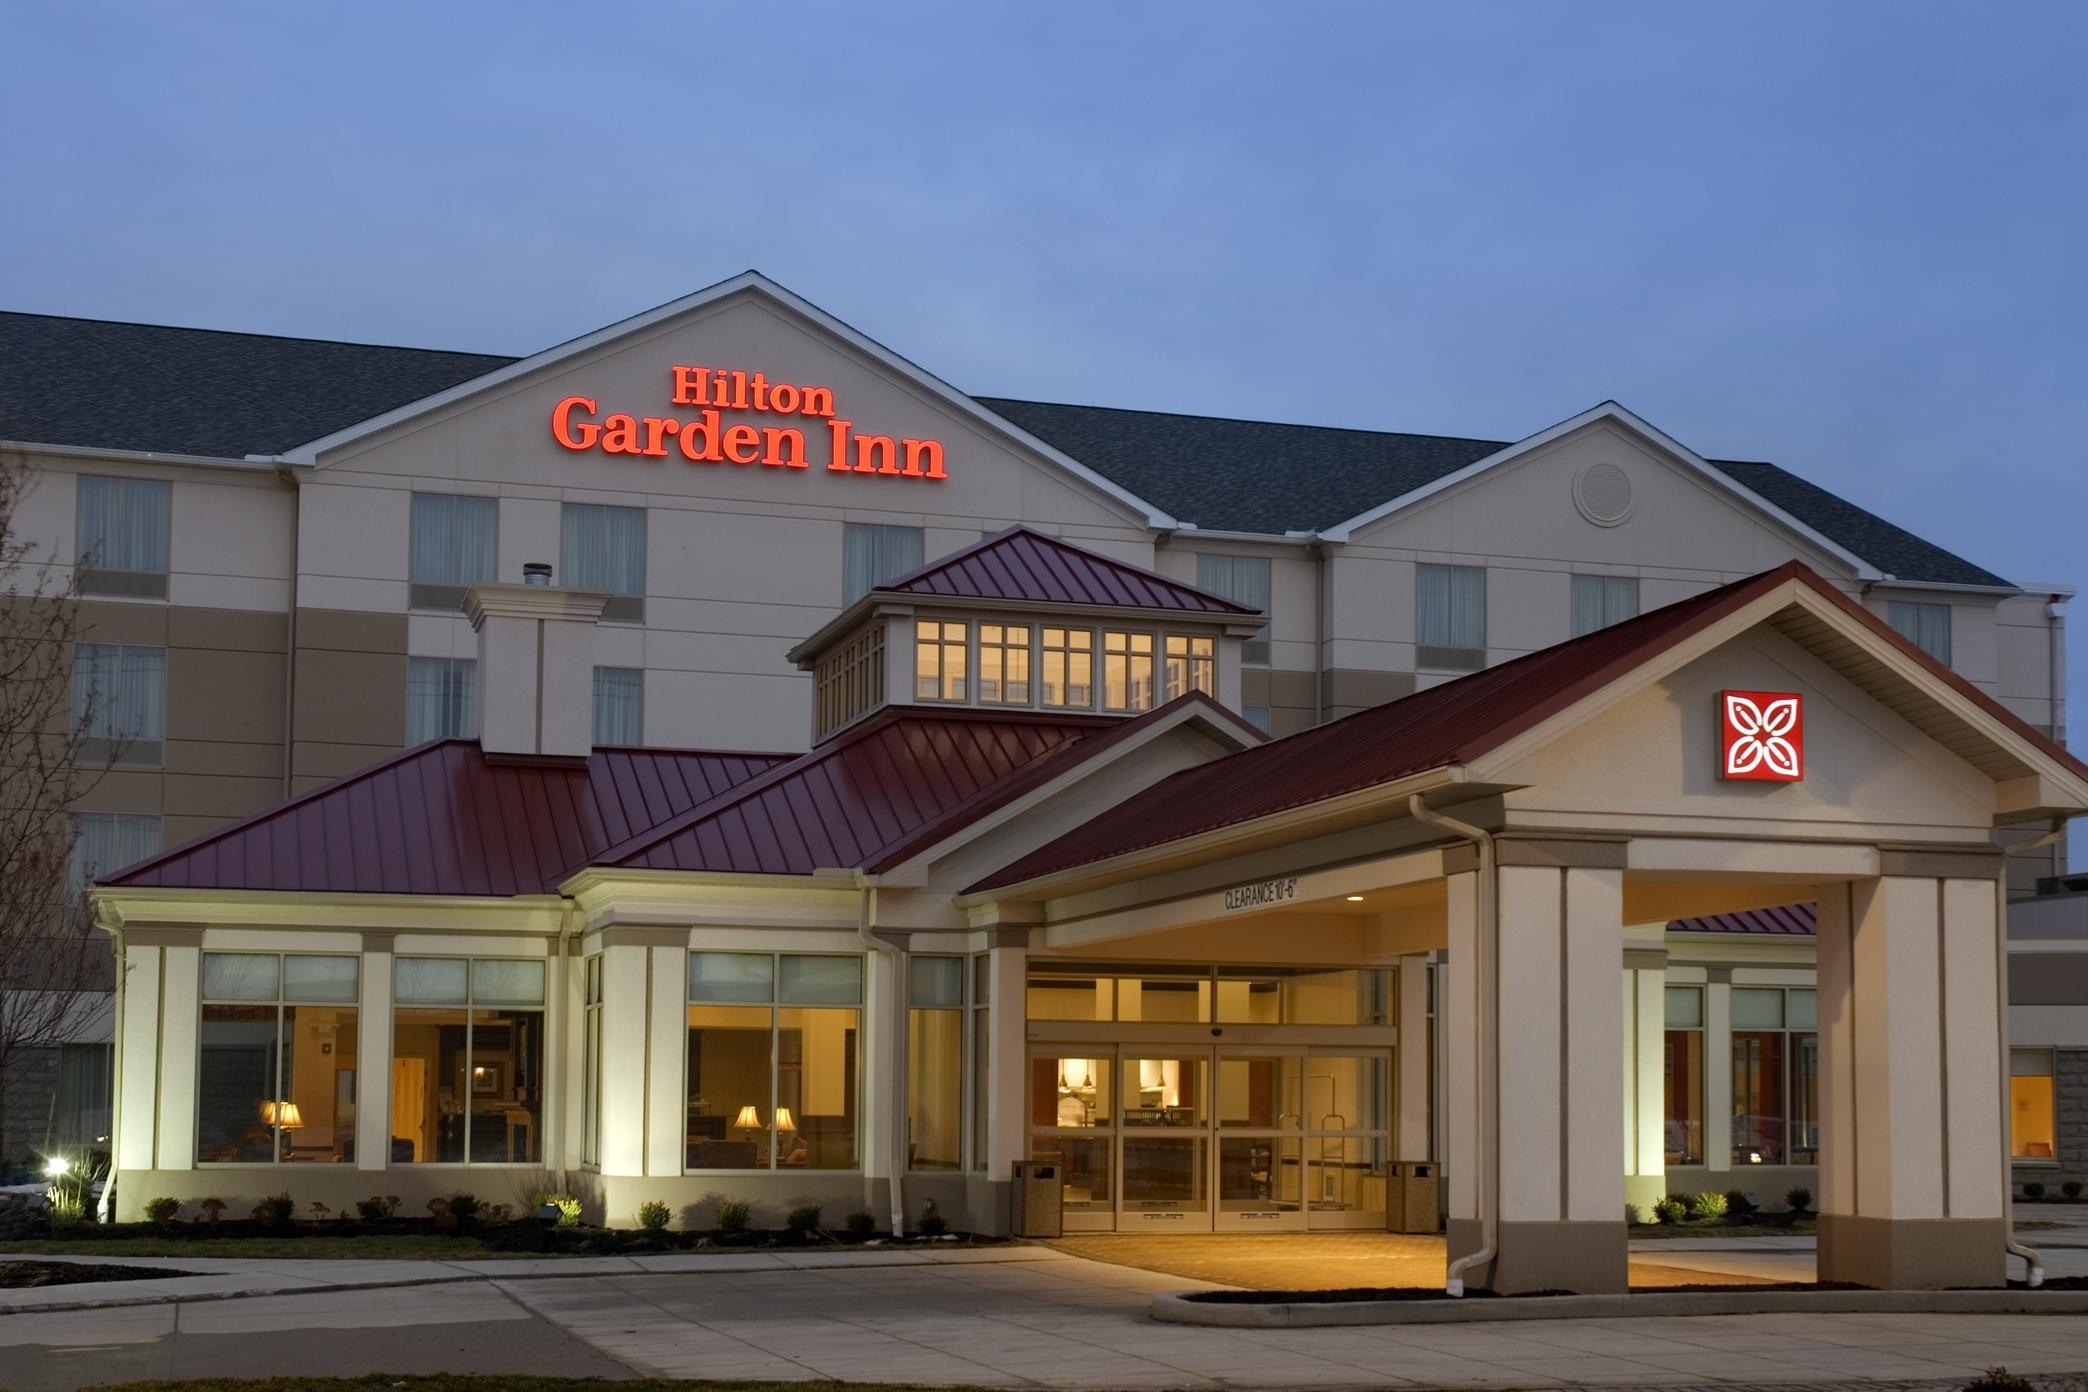 Hilton Garden Inn Cleveland East Mayfield Village 700 Beta Drive